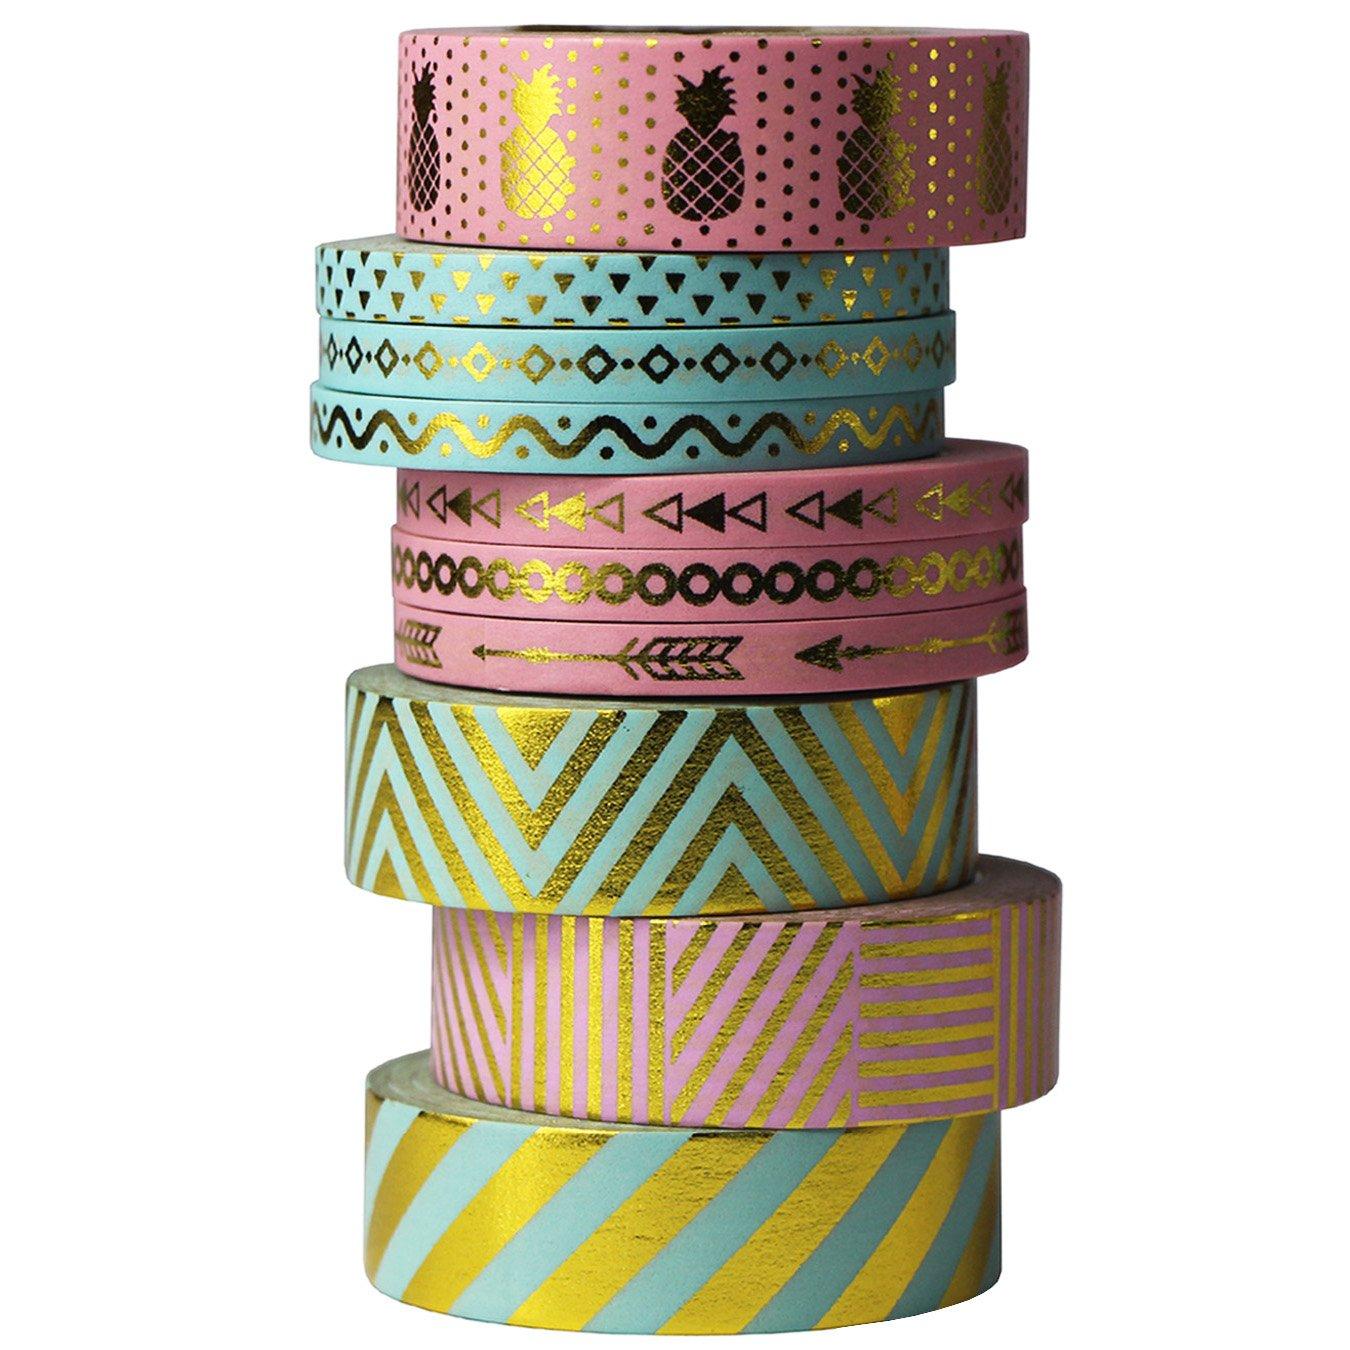 UOOOM 10pcs Decorative Sticker Paper Gold Foil Washi Tape Masking Tape Adhesive Scrapbooking DIY Craft Gift (Design 9063)